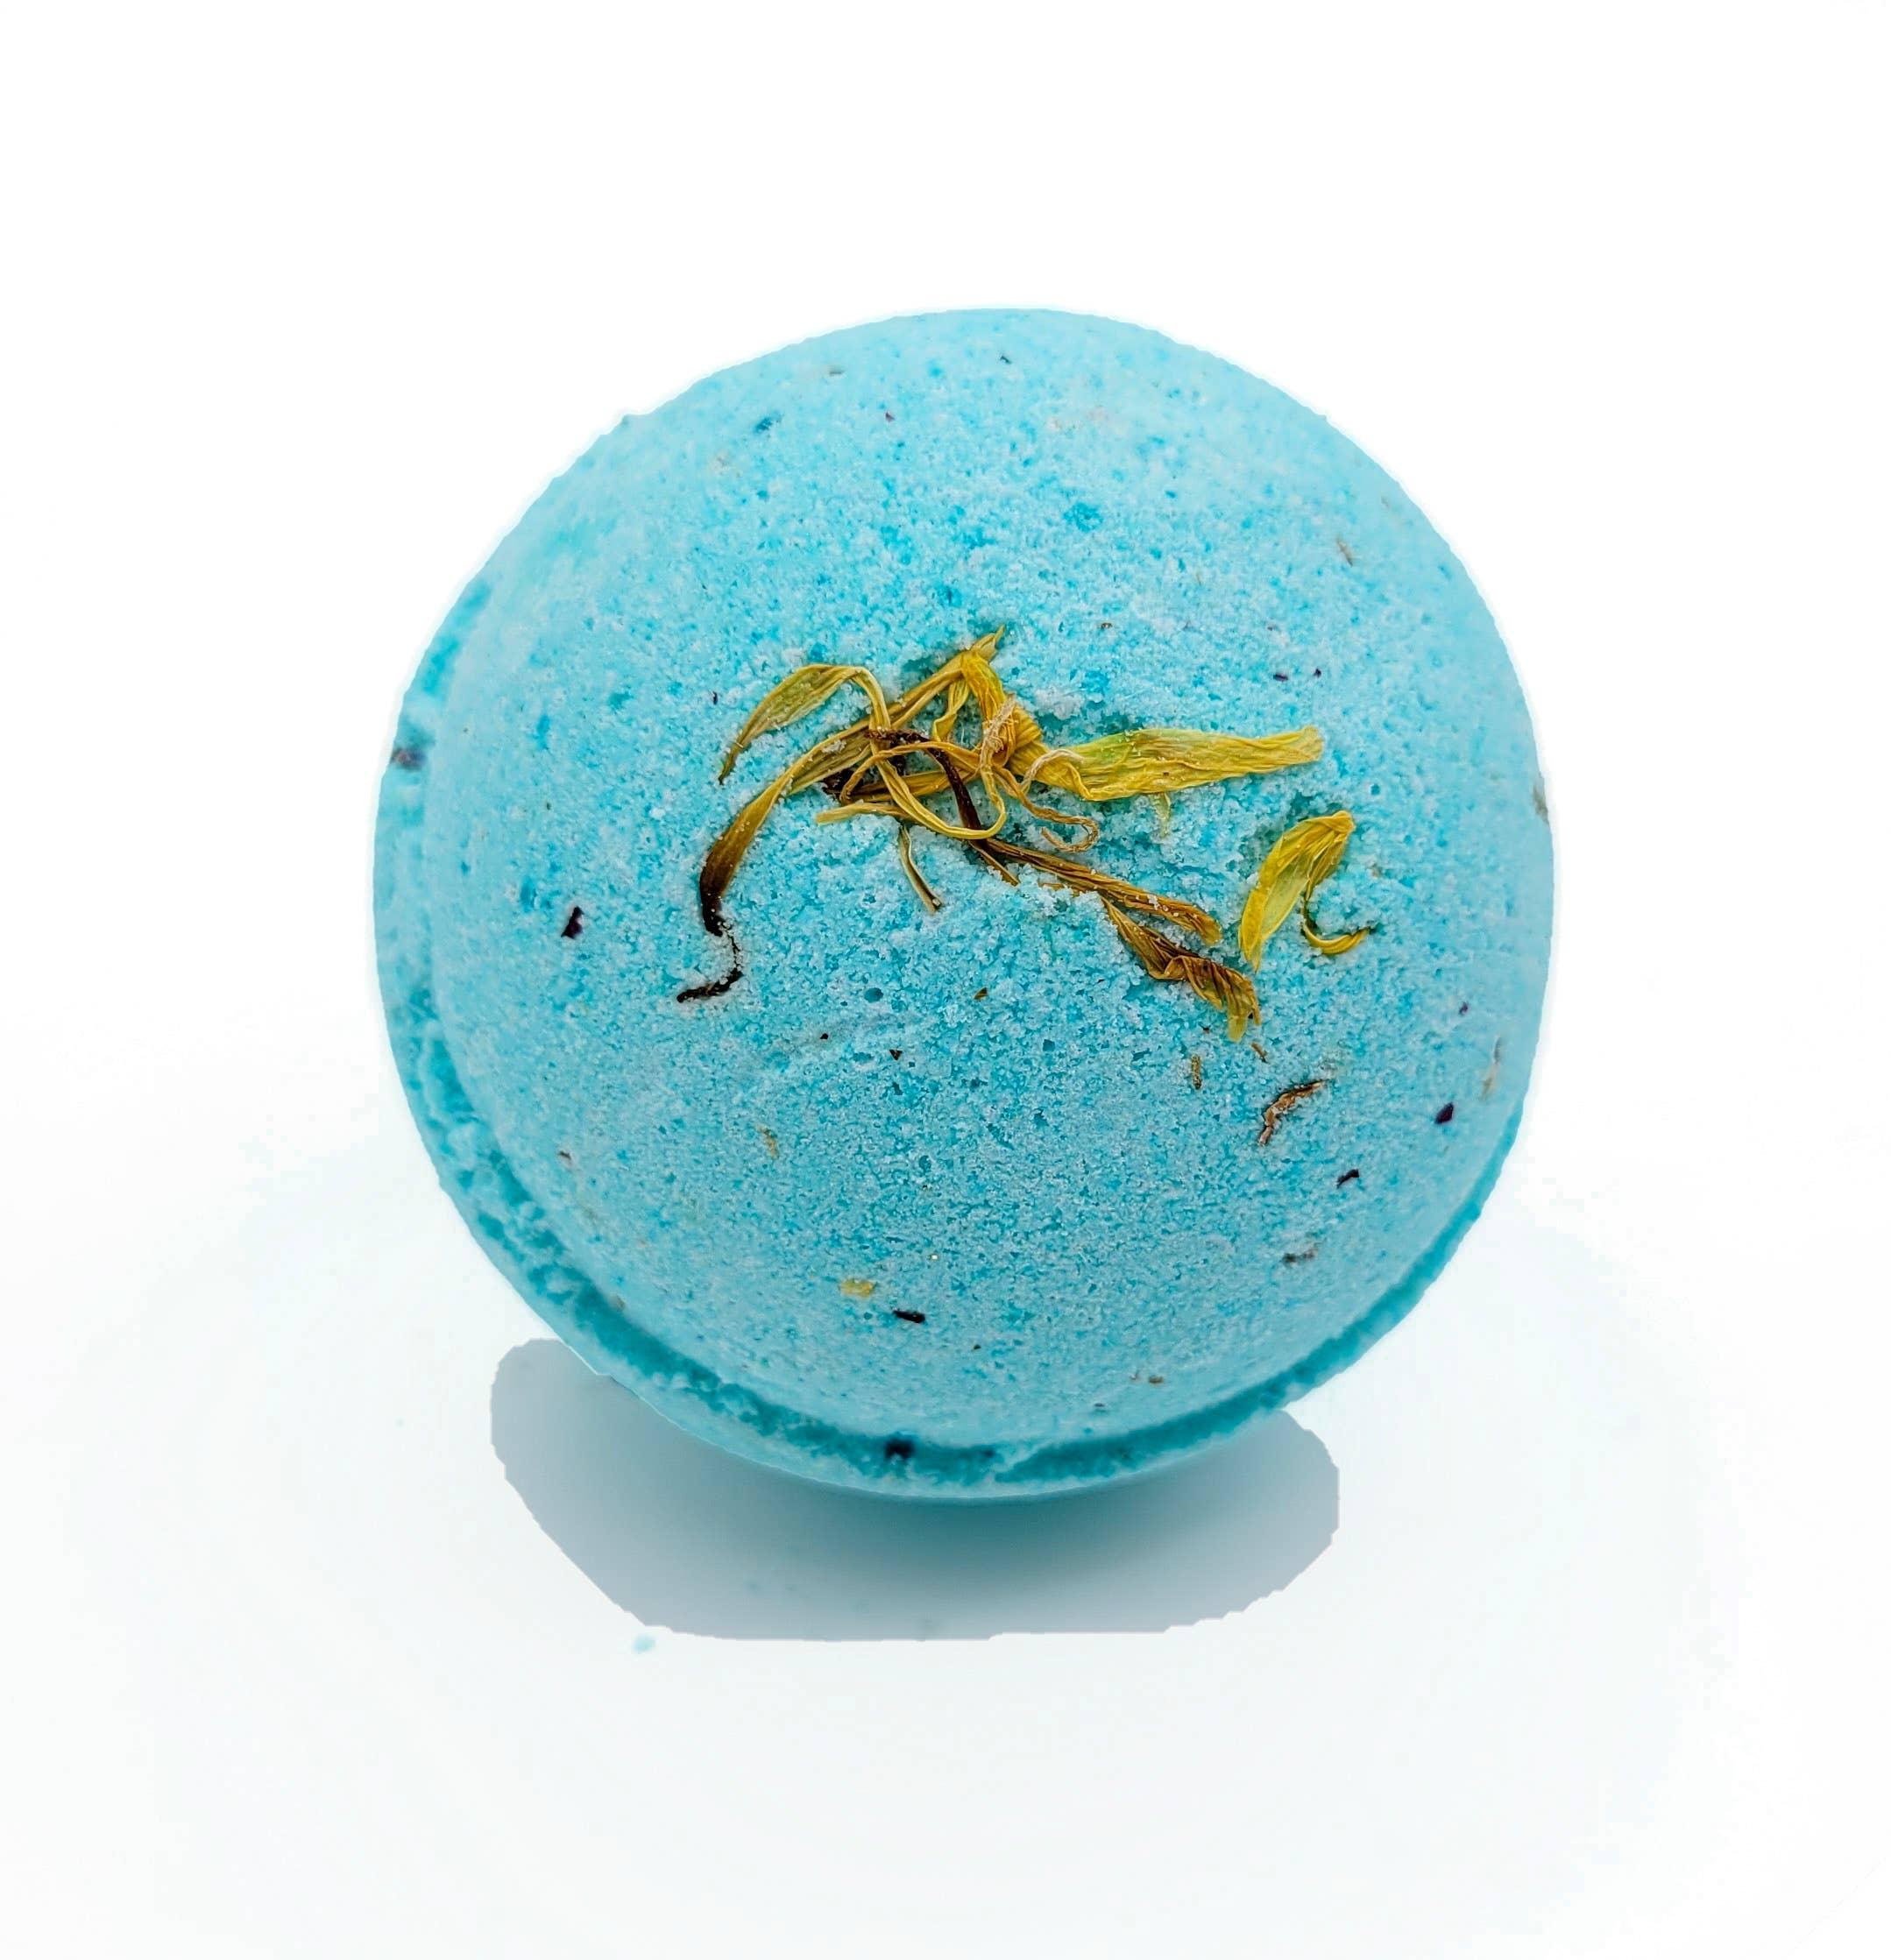 Evolve - Bath Bomb - Botanica | Trada Marketplace